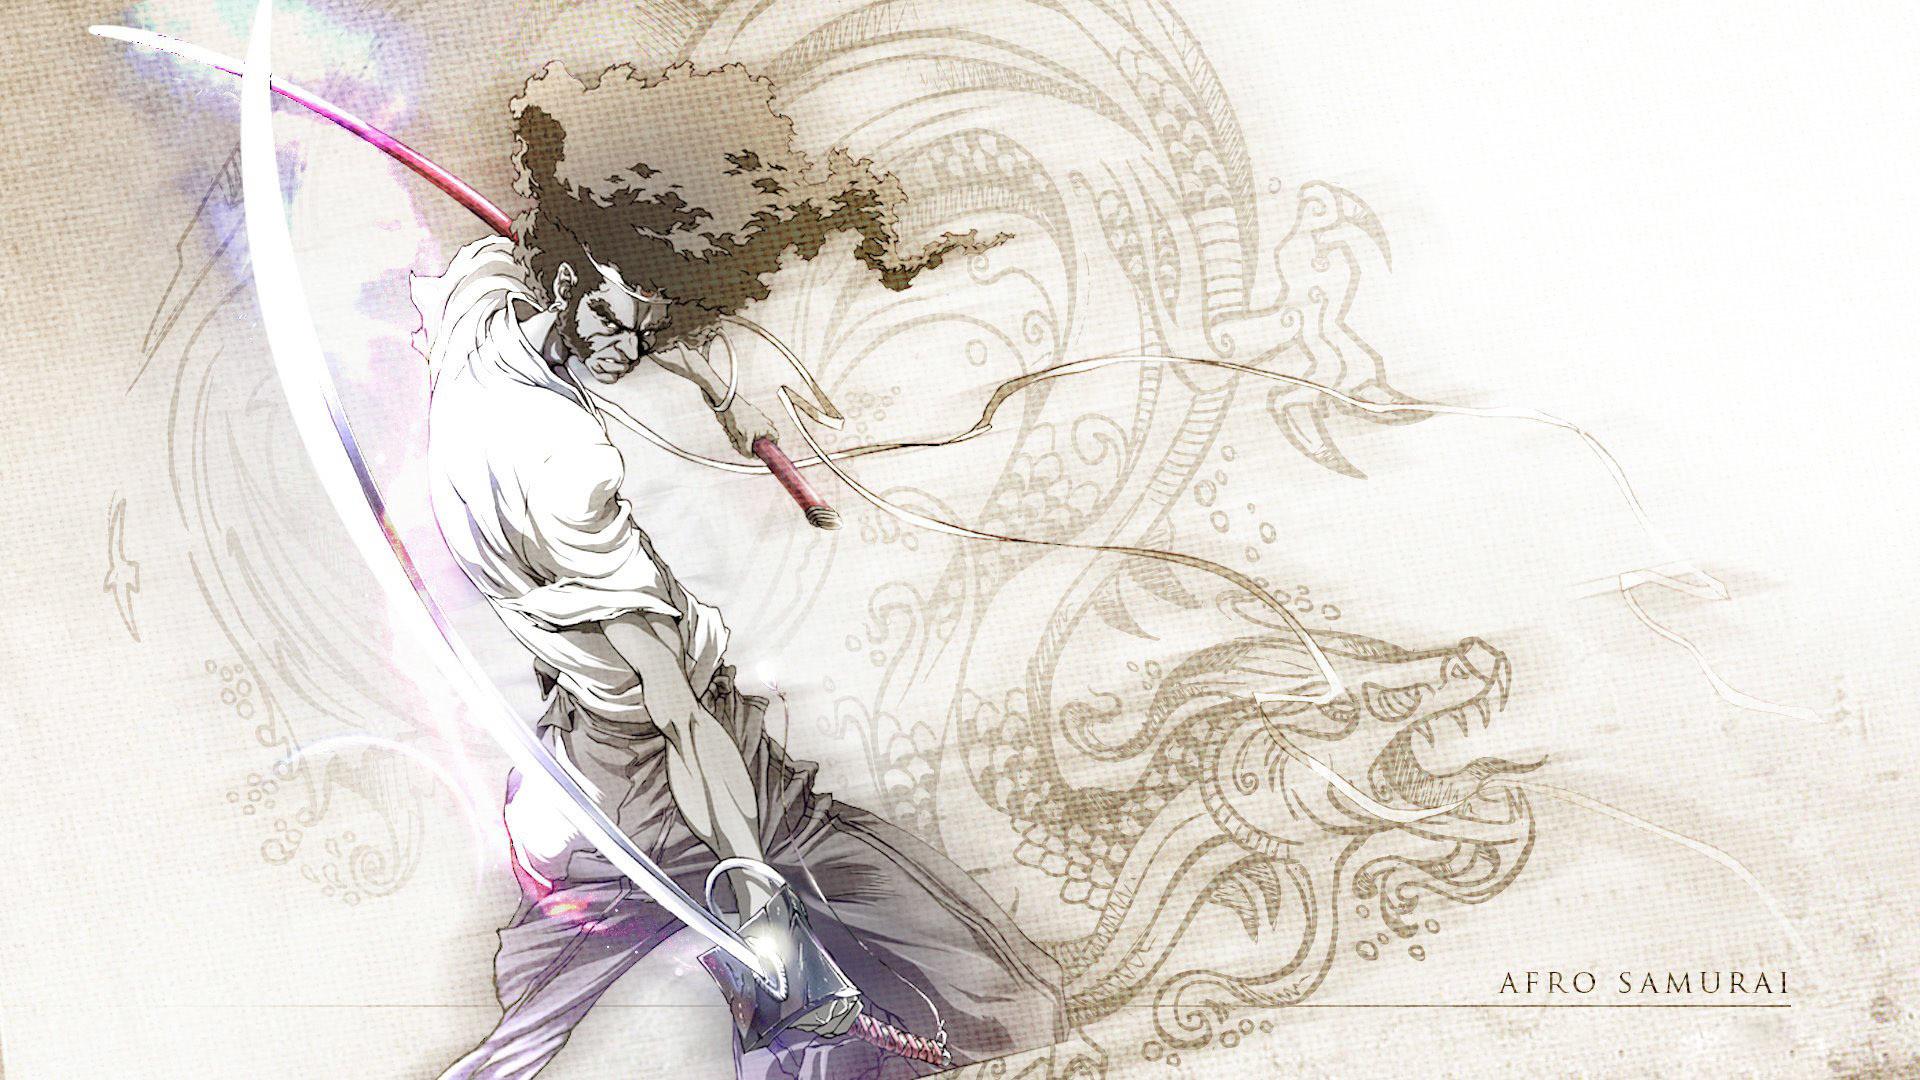 Afro Samurai HD Wallpaper 1920×1080